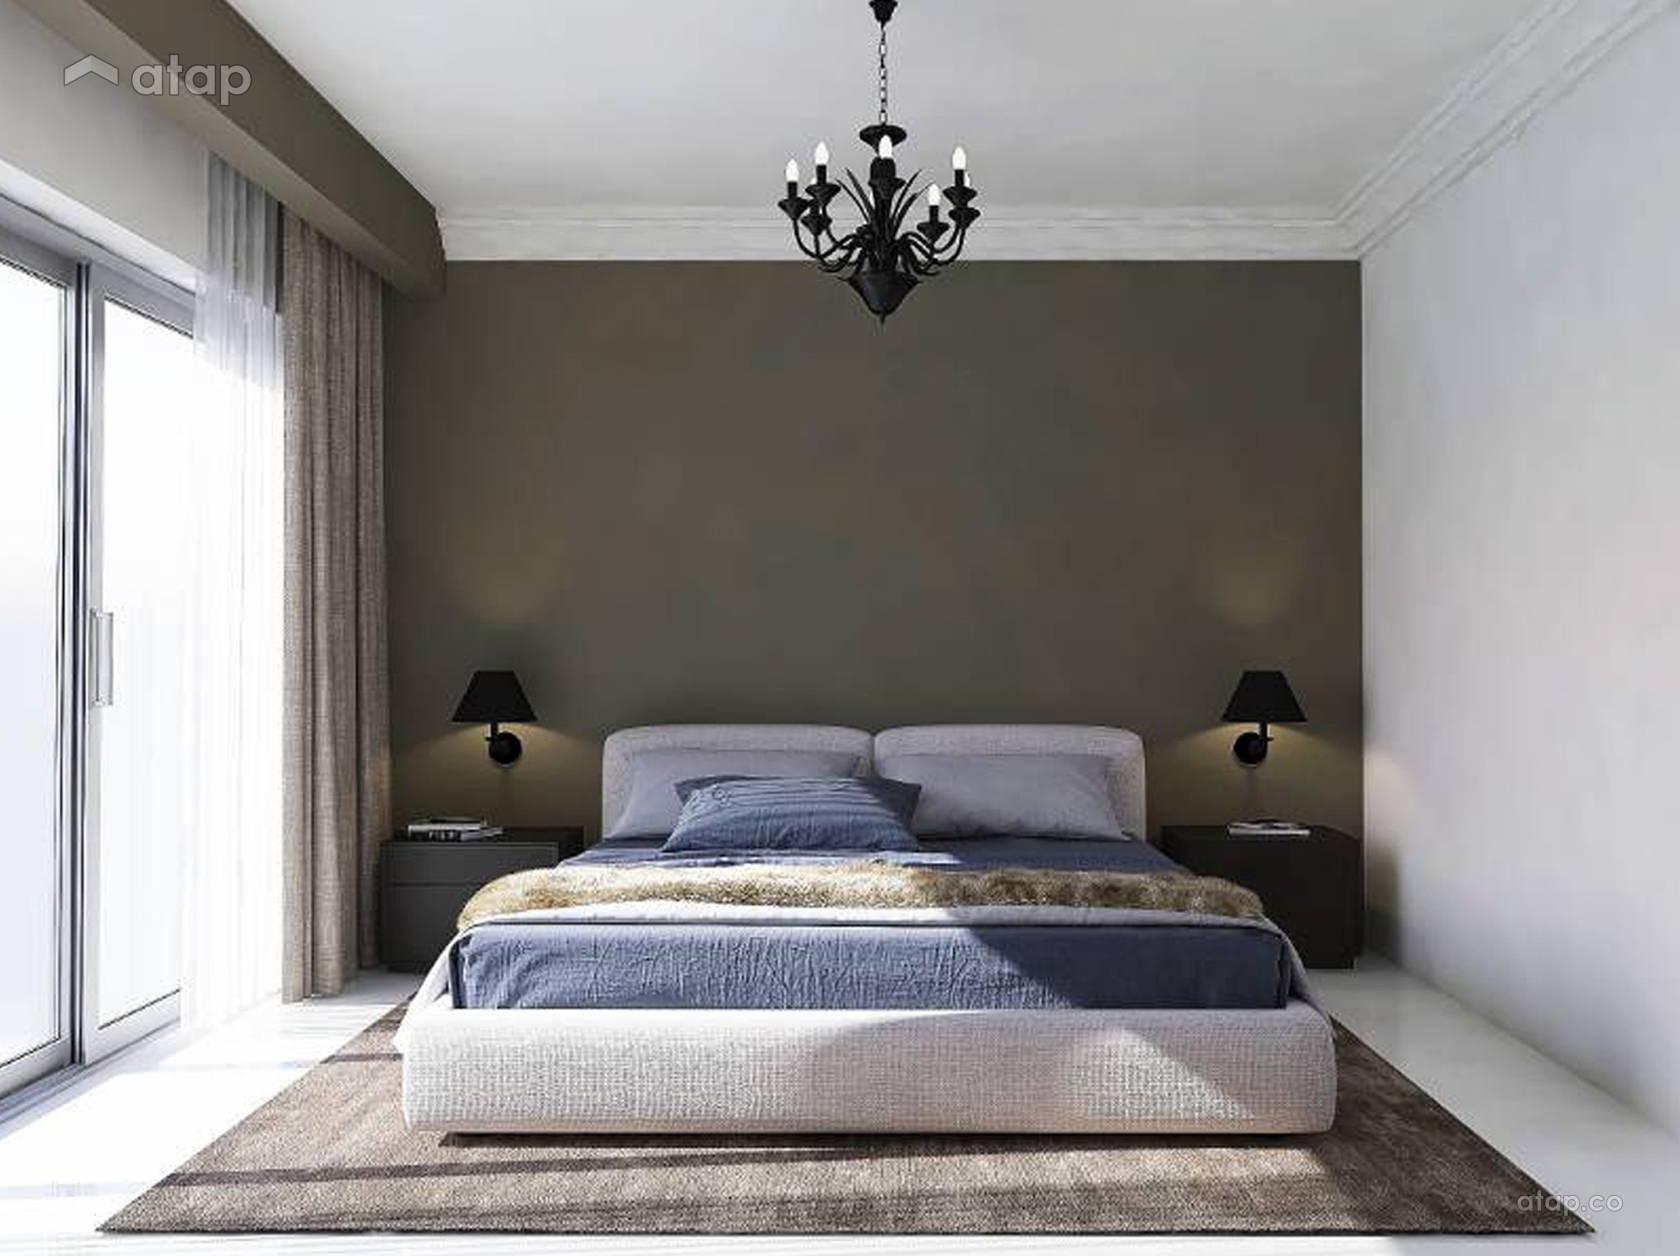 Apartment Design - in Nairobi, Kenya interior design renovation